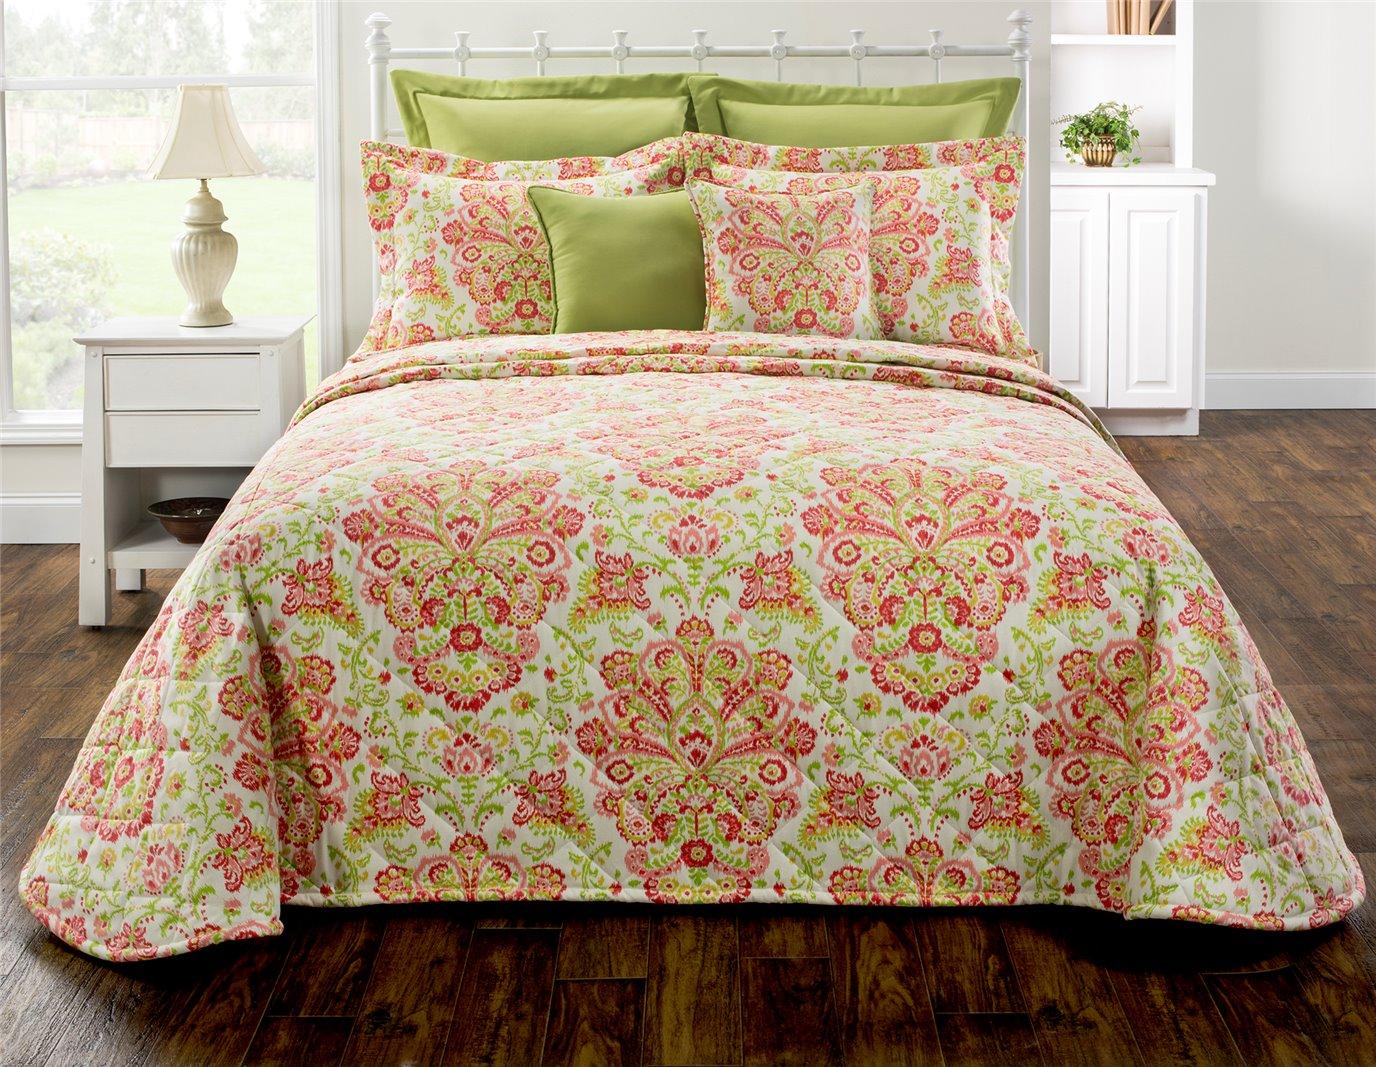 Provence Poppy Full Bedspread